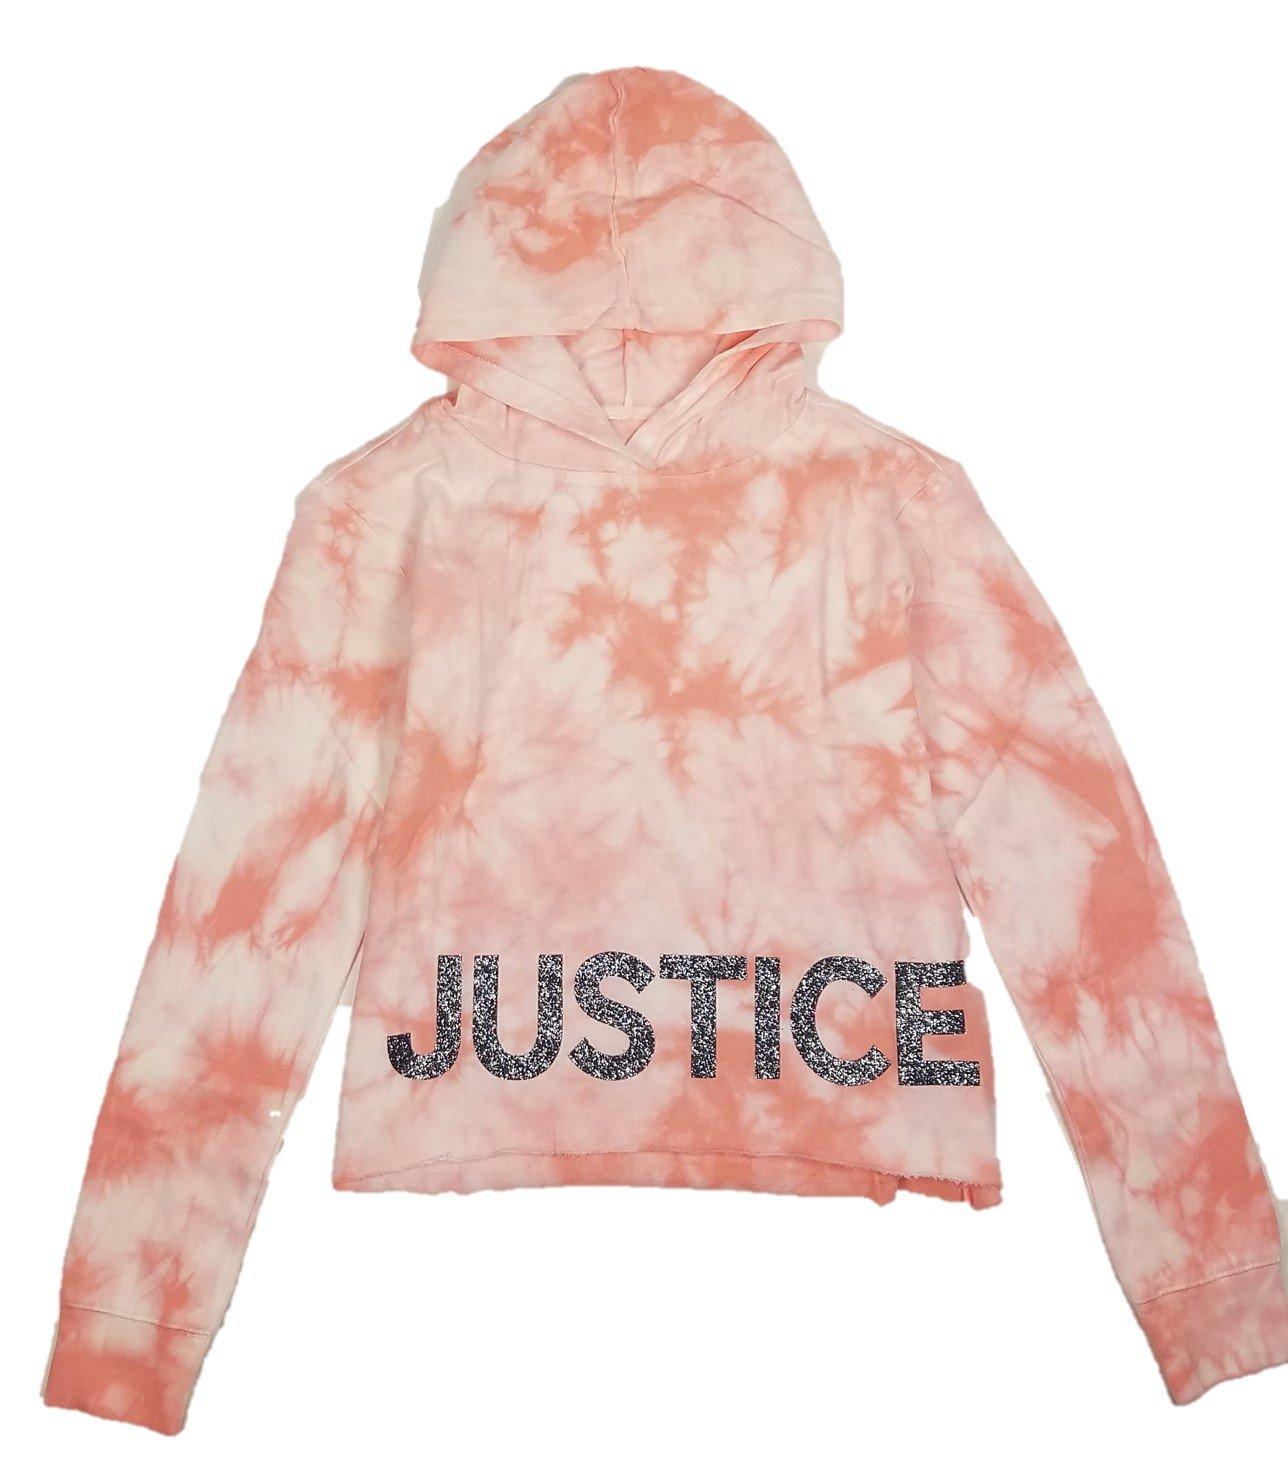 f401884bea65f2 Get Quotations · Justice Girls Hoodie Sweatshirt Raw Hem Glitter Logo  Cloudy Tie-Dye